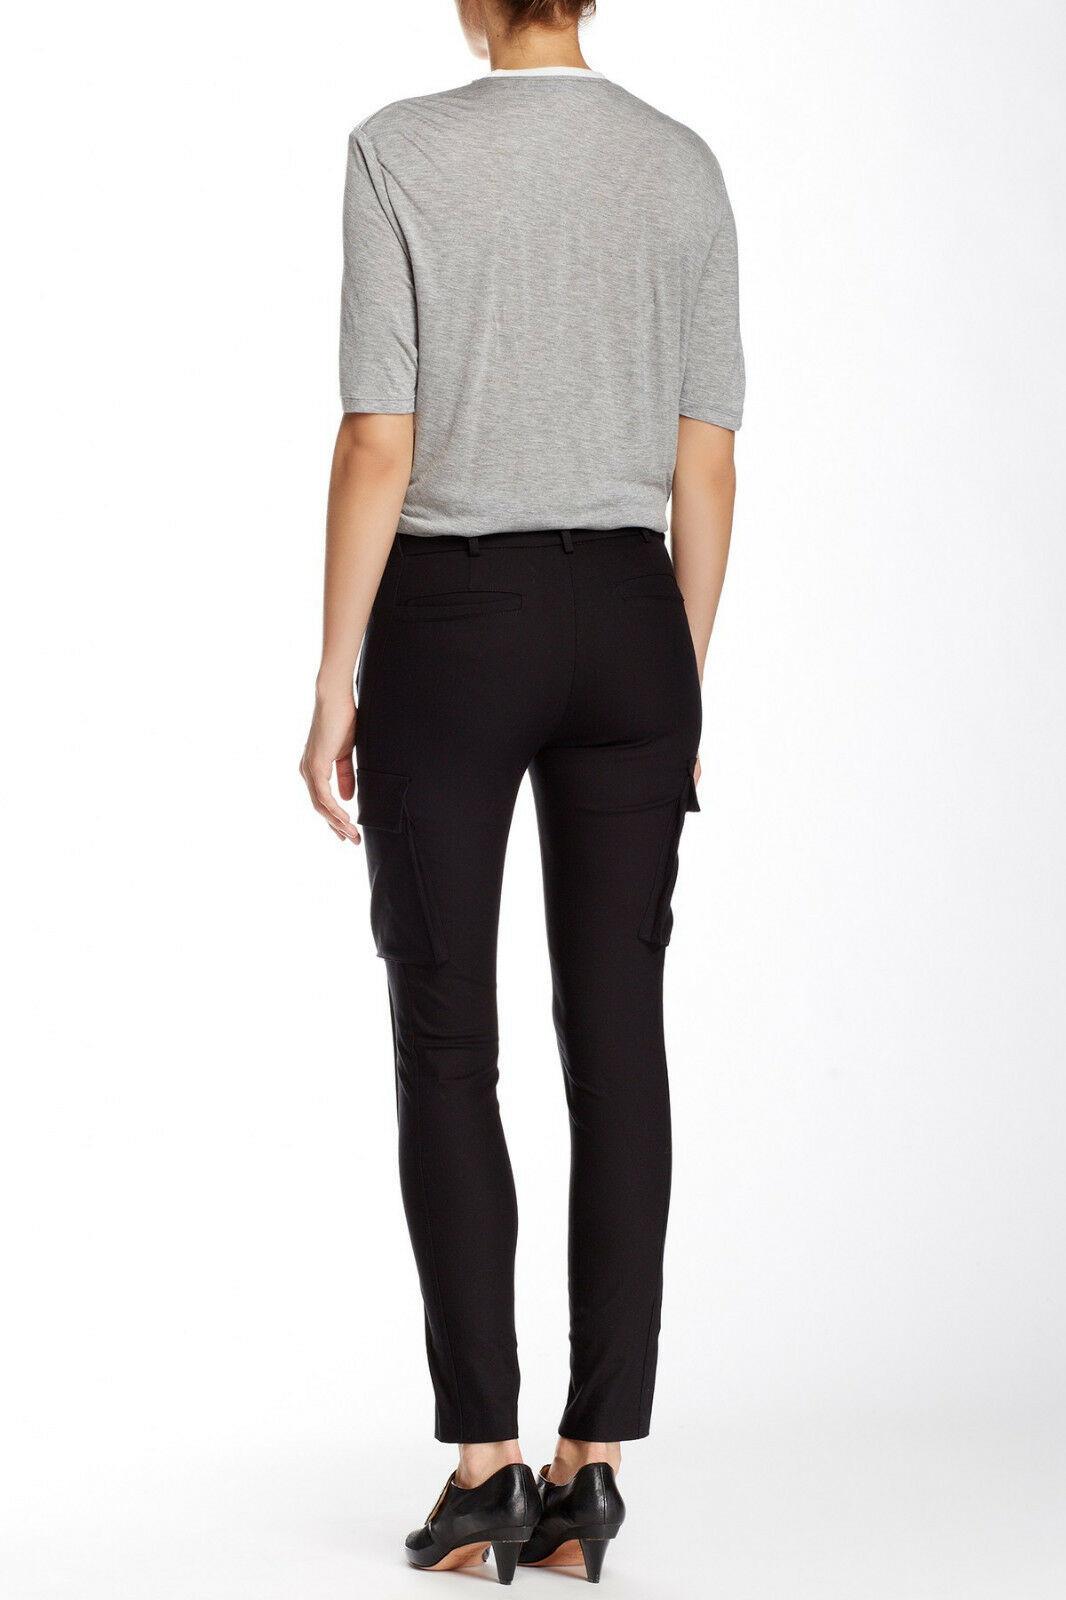 New Womens Designer NWT LAMB Gwen Stefani Cargo Pants Stretch Skinny 6 Black image 3